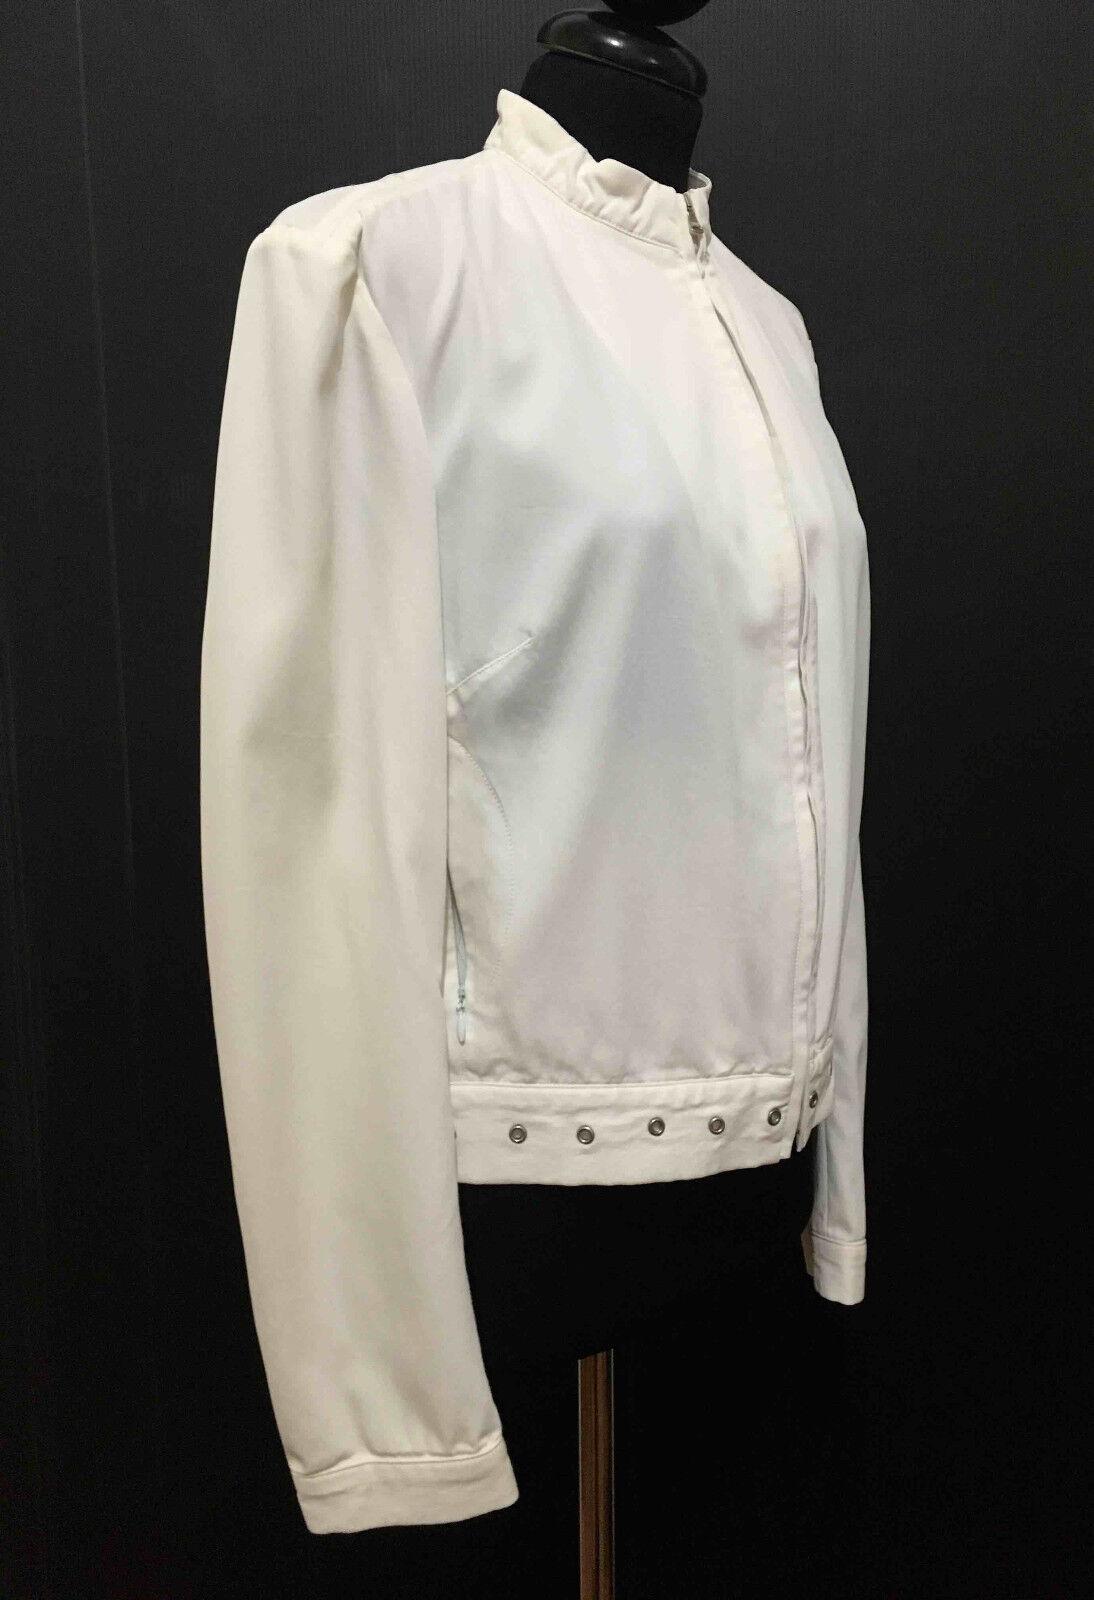 GFF GIANFRANCO FERRE Giubbotto Giacca Donna Elegance Donna Jacket Jacket Jacket Sz.S - 42 d3ed20